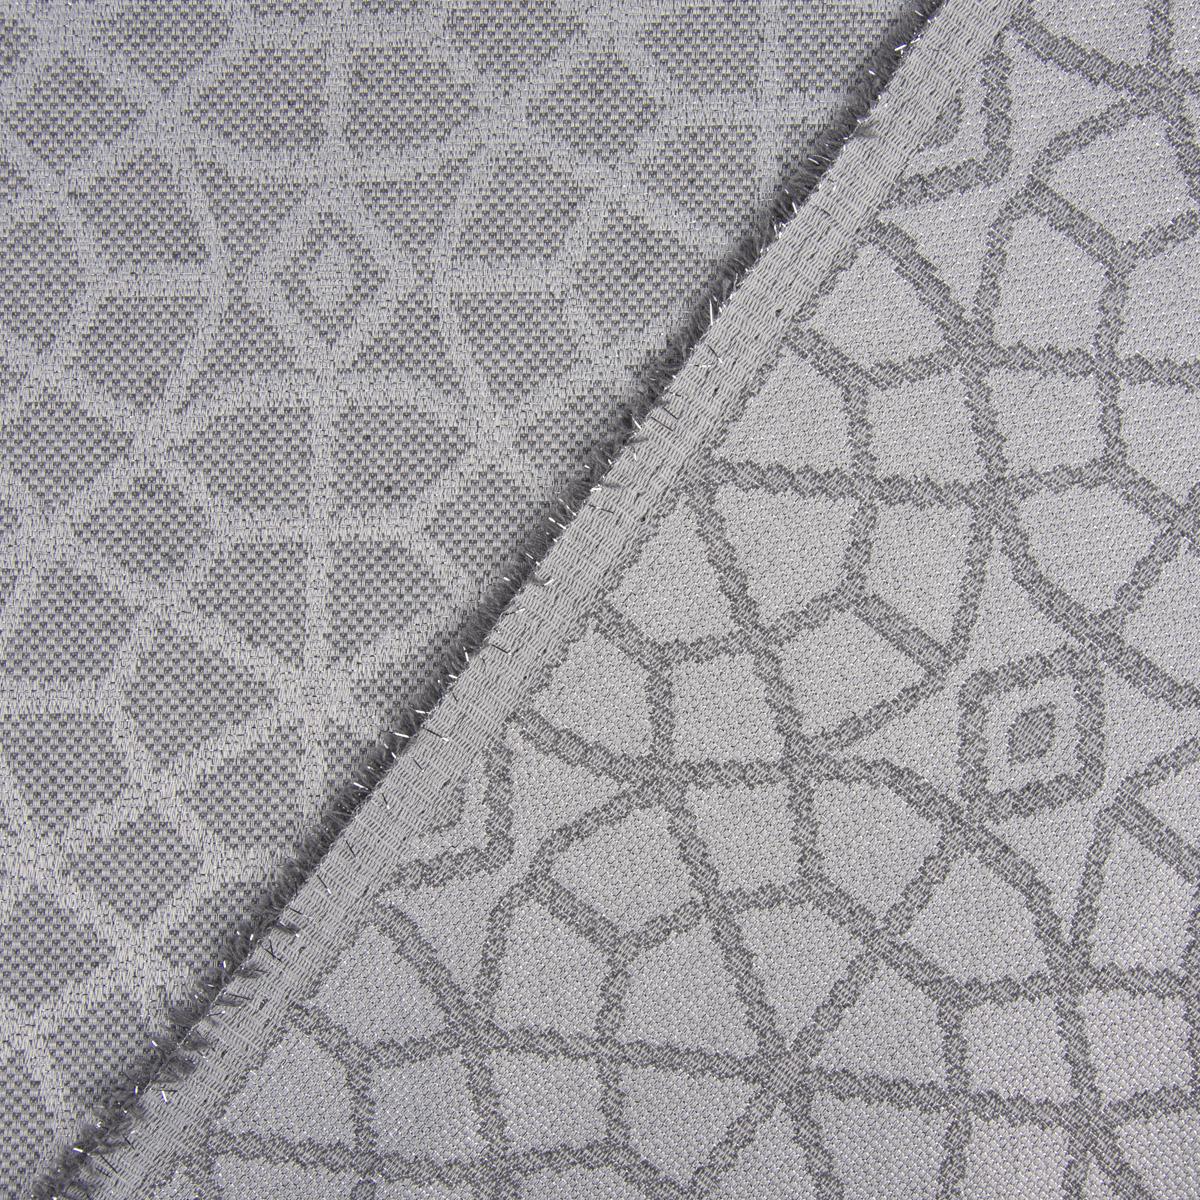 Dekostoff Jacquard Doubleface Glitzer geometrisch Kreise grau silberfarbig 2,80m Breite